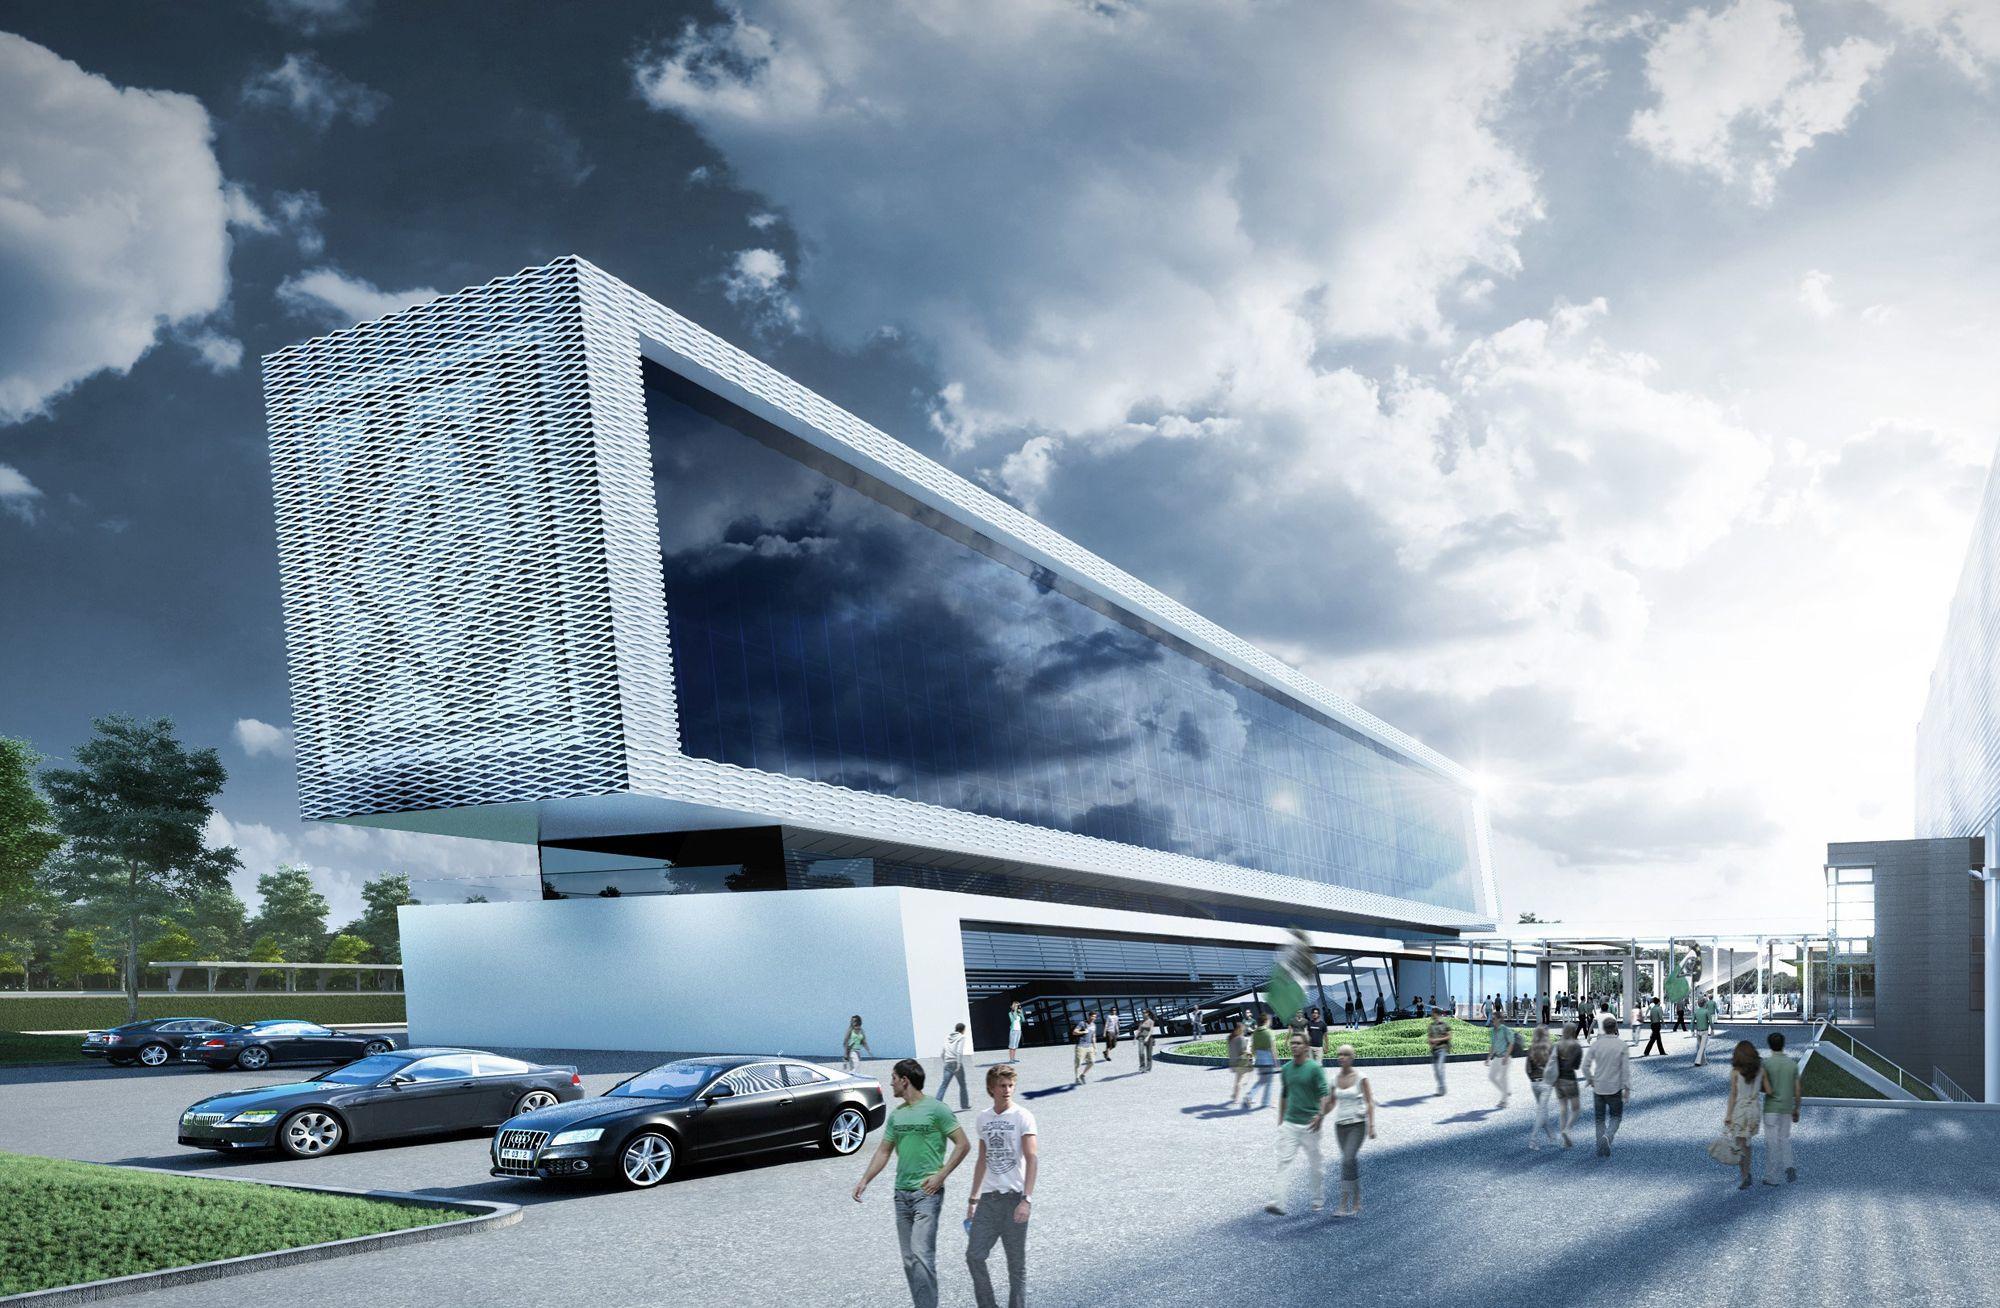 Foto: sop architekten